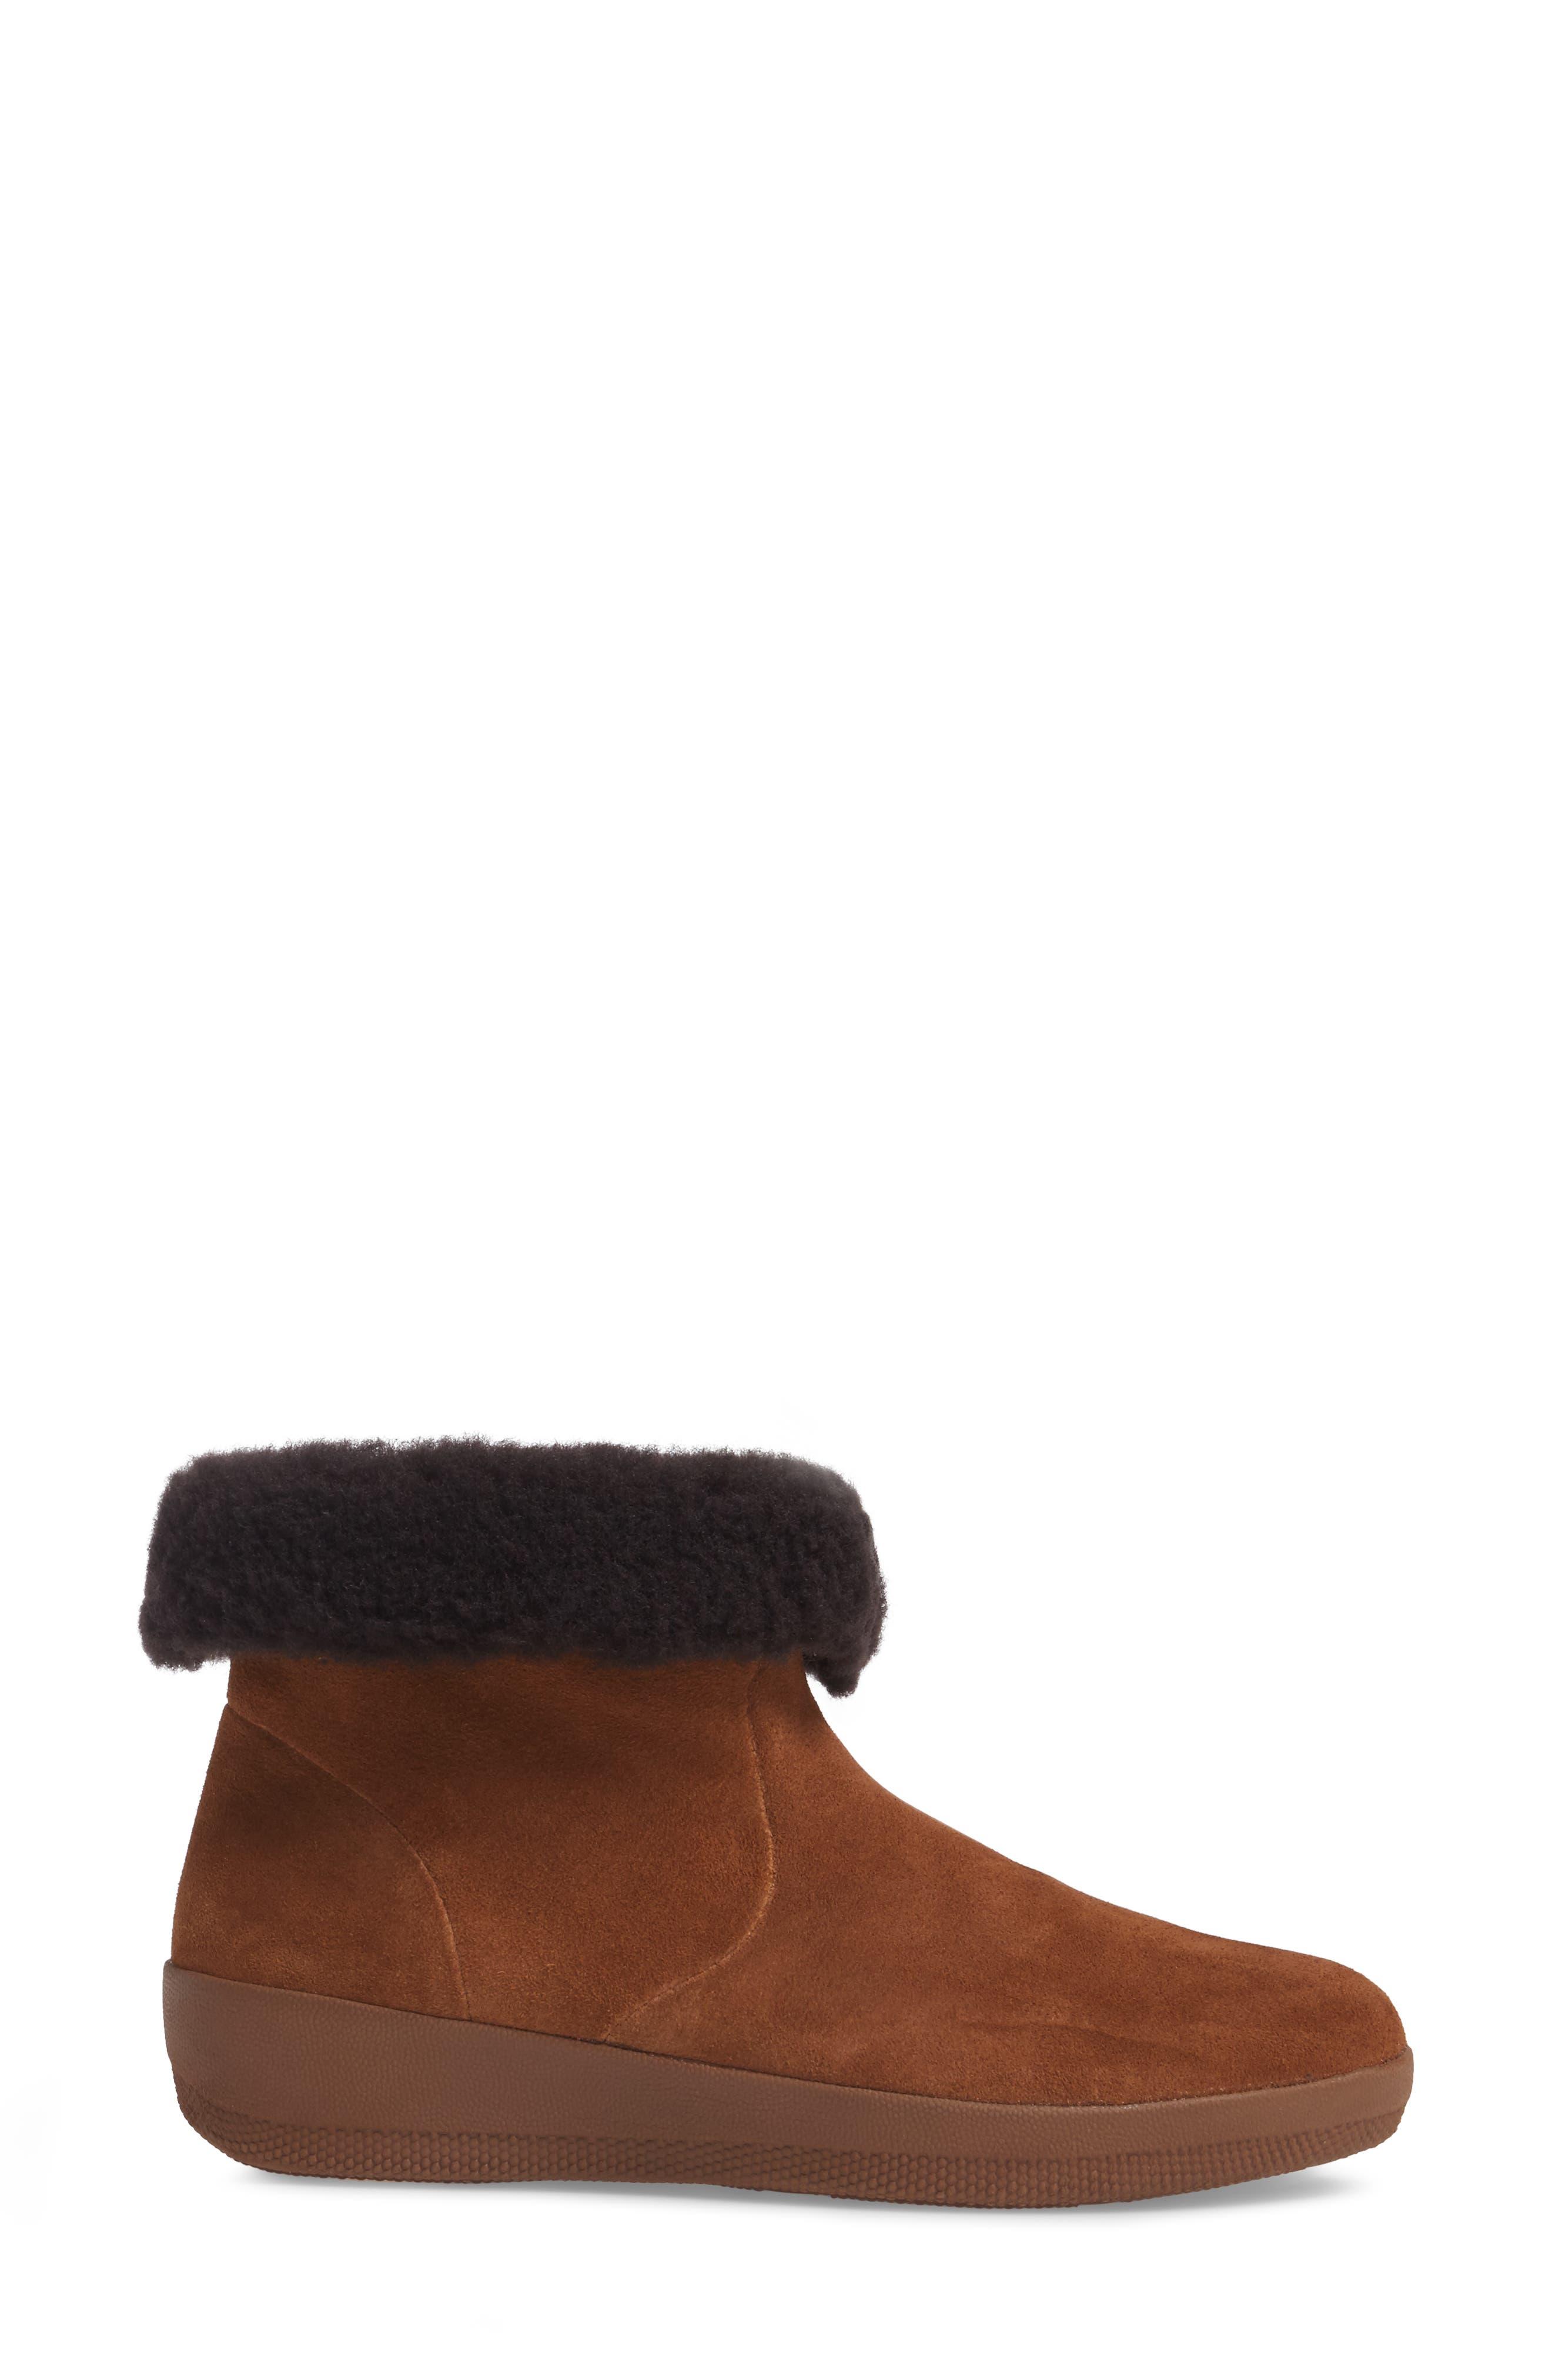 Skate Genuine Shearling Cuff Boot,                             Alternate thumbnail 3, color,                             Chestnut